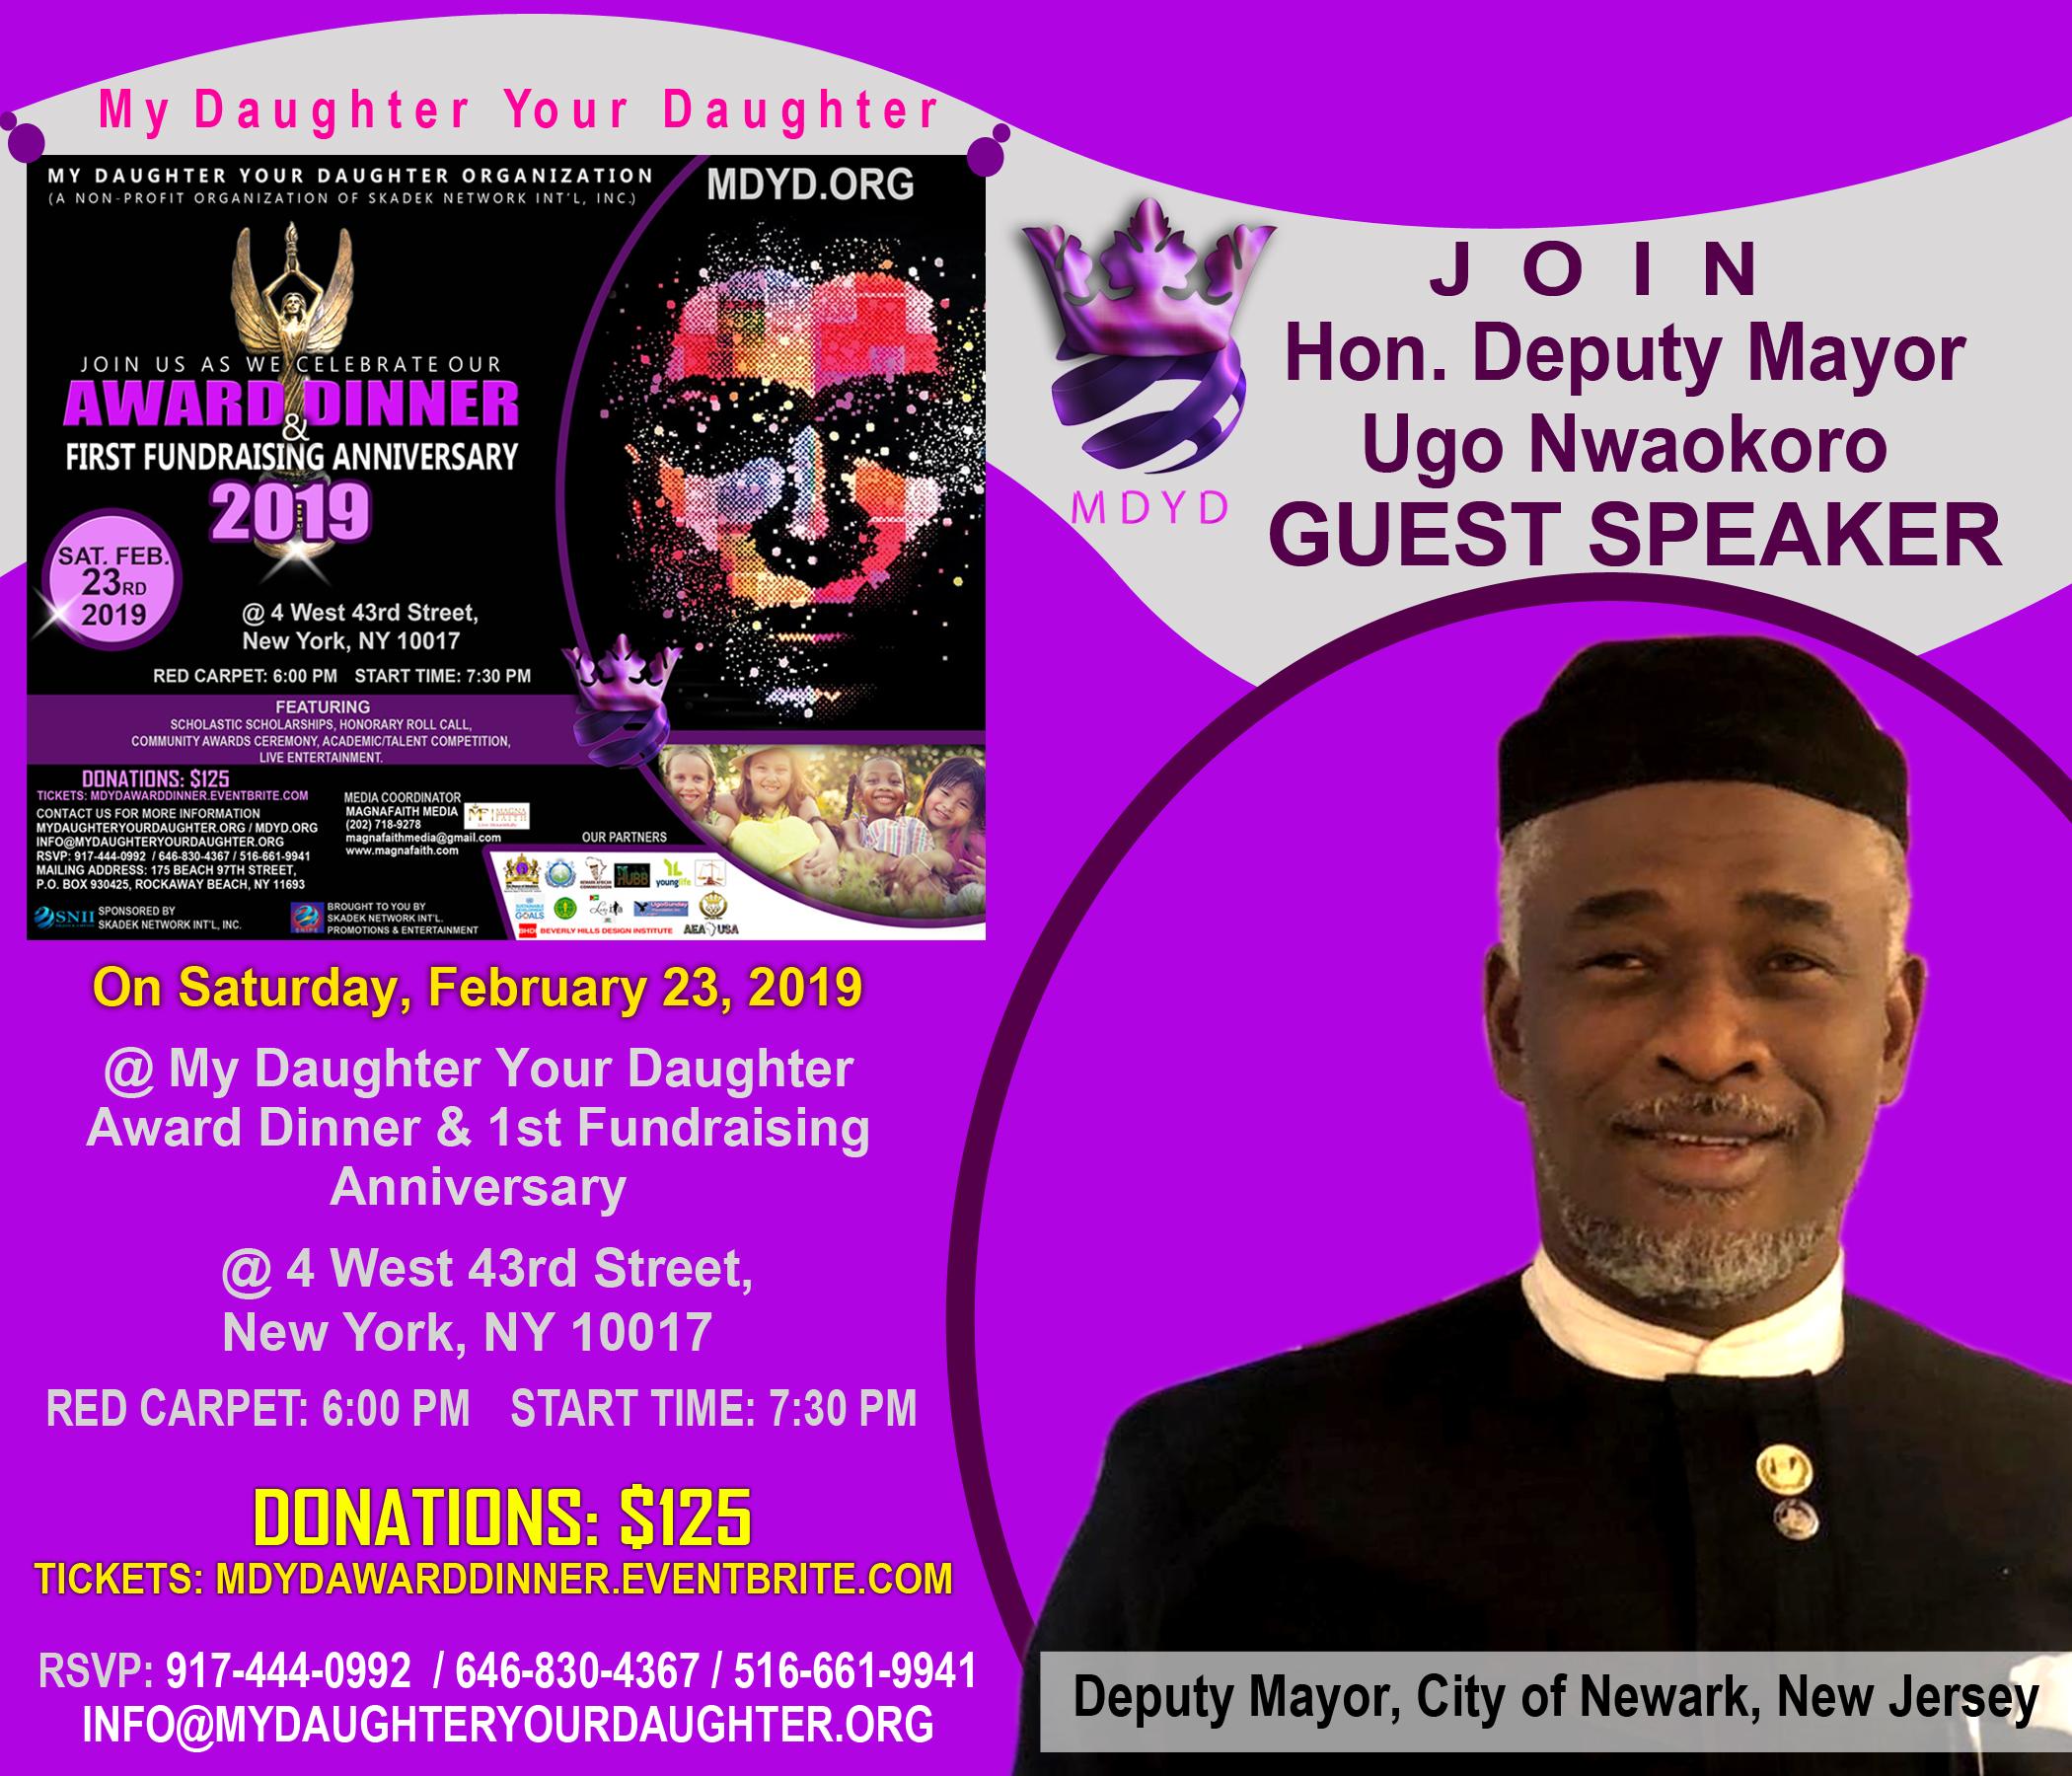 MDYD Promo Card - Hon. Deputy Mayor Ugo Nwaokoro